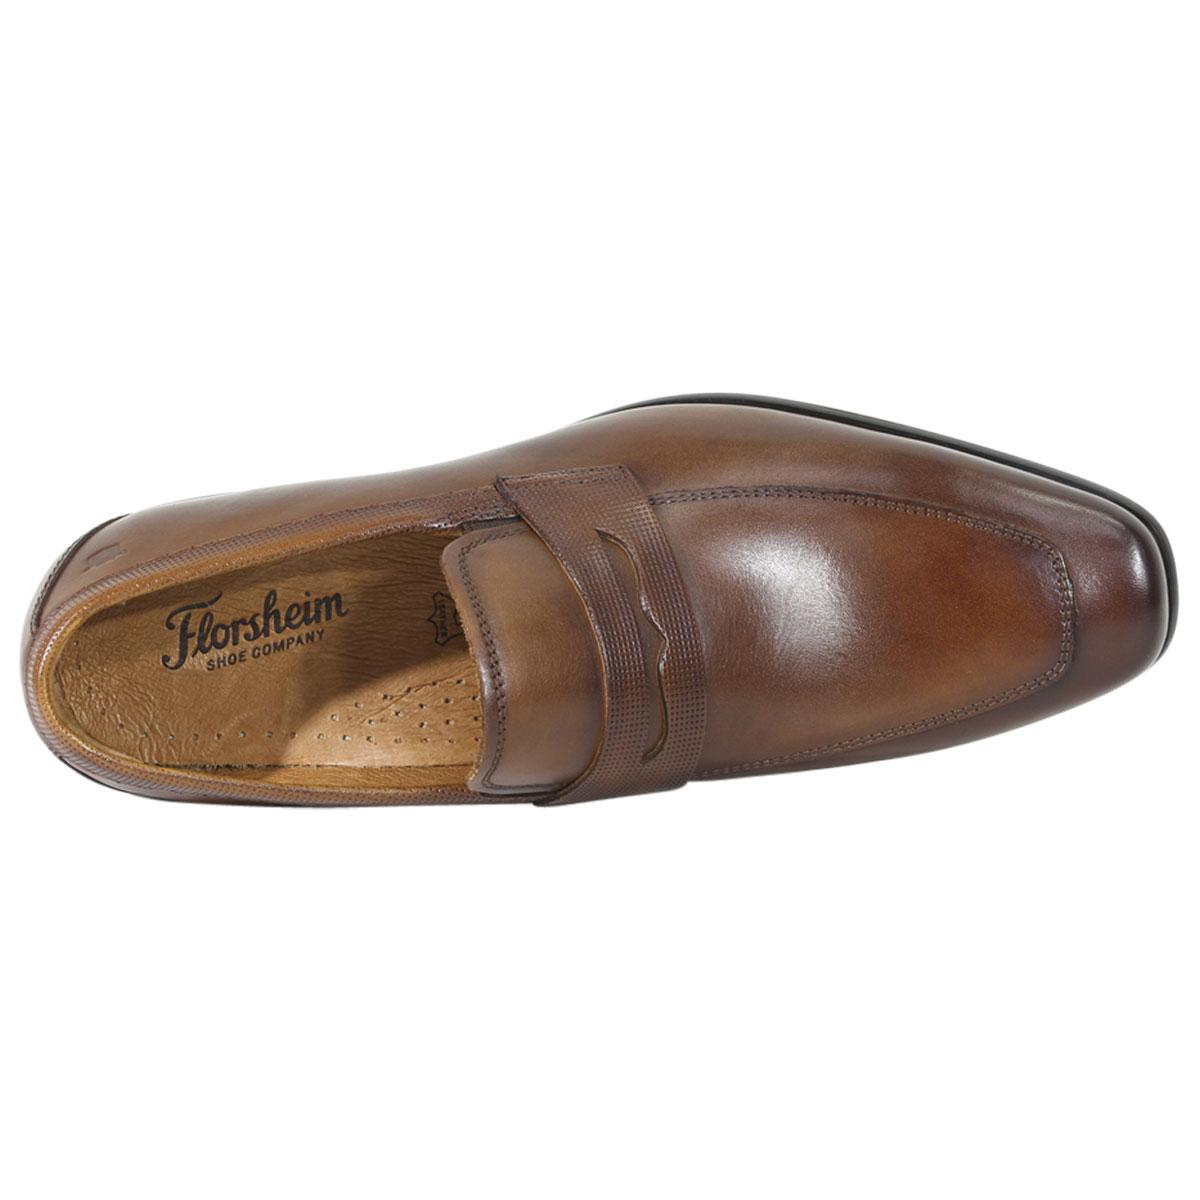 Florsheim-Men-039-s-Postino-Penny-Loafers-Shoes thumbnail 21